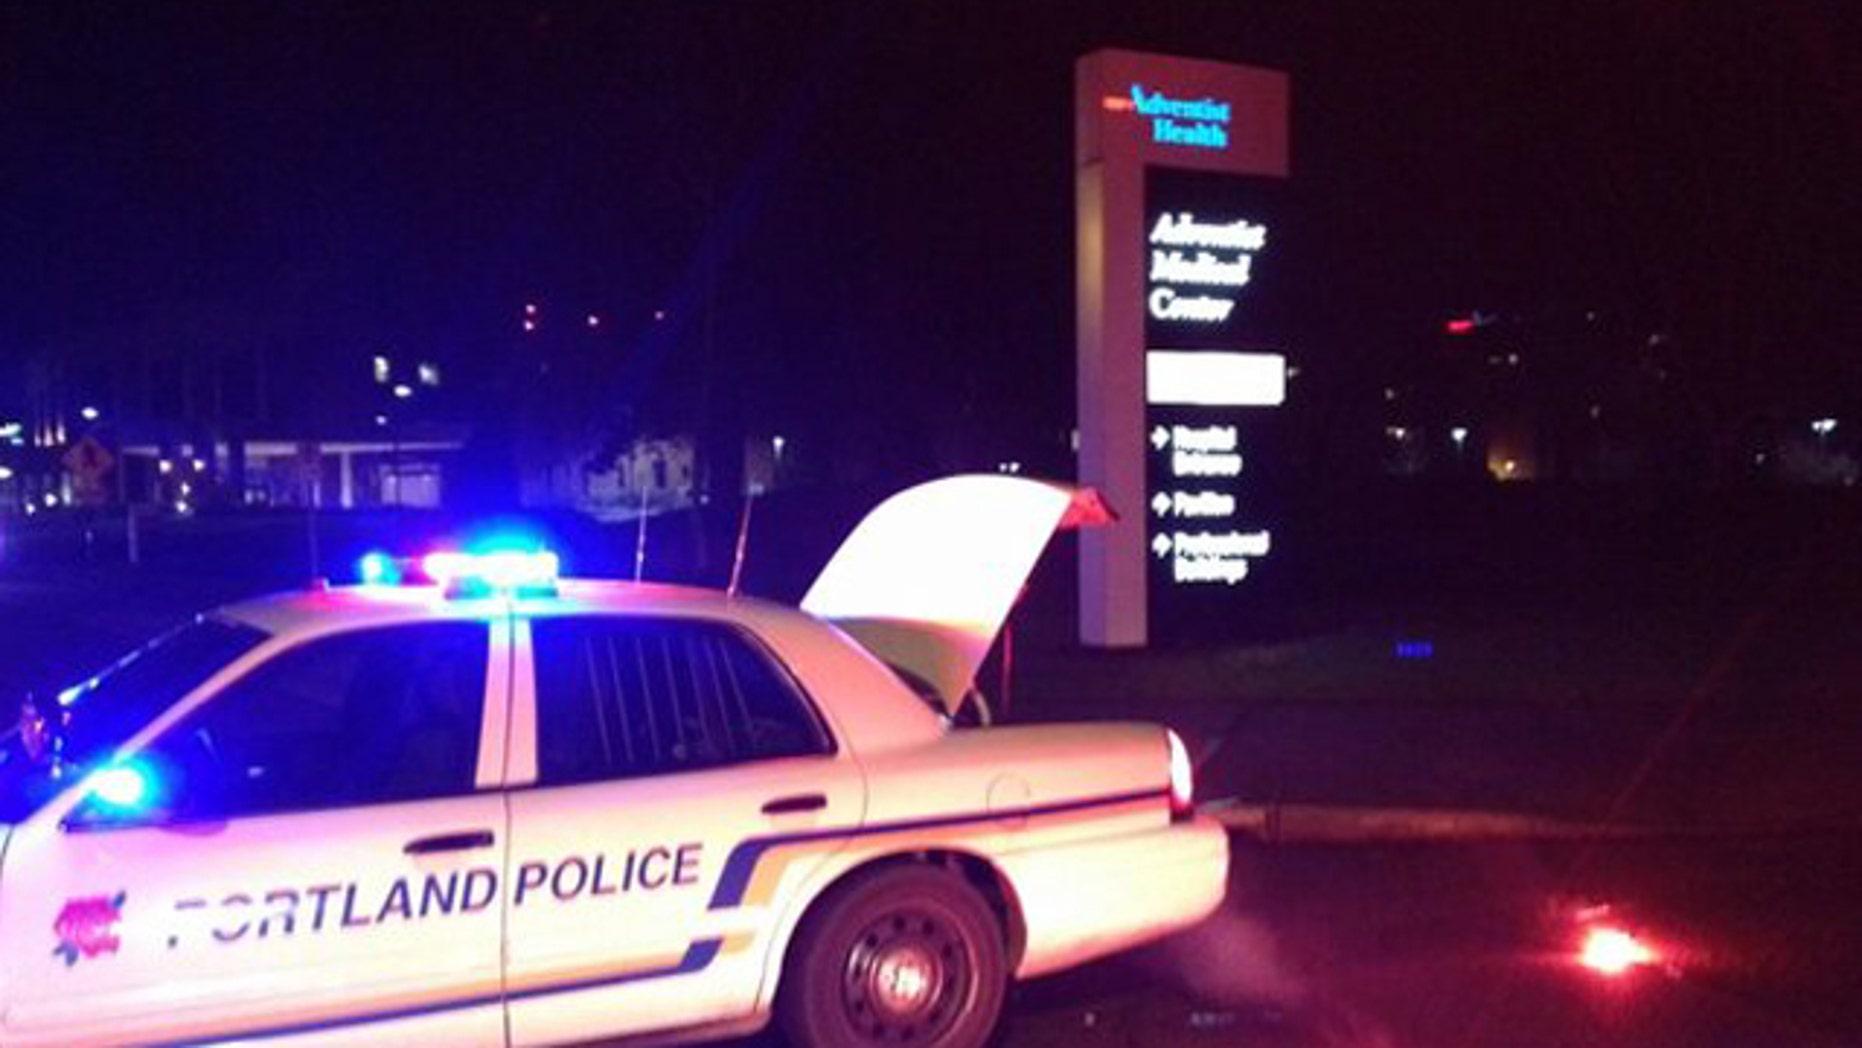 Feb. 17, 2013: Police investigate a shooting near a Portland hospital.